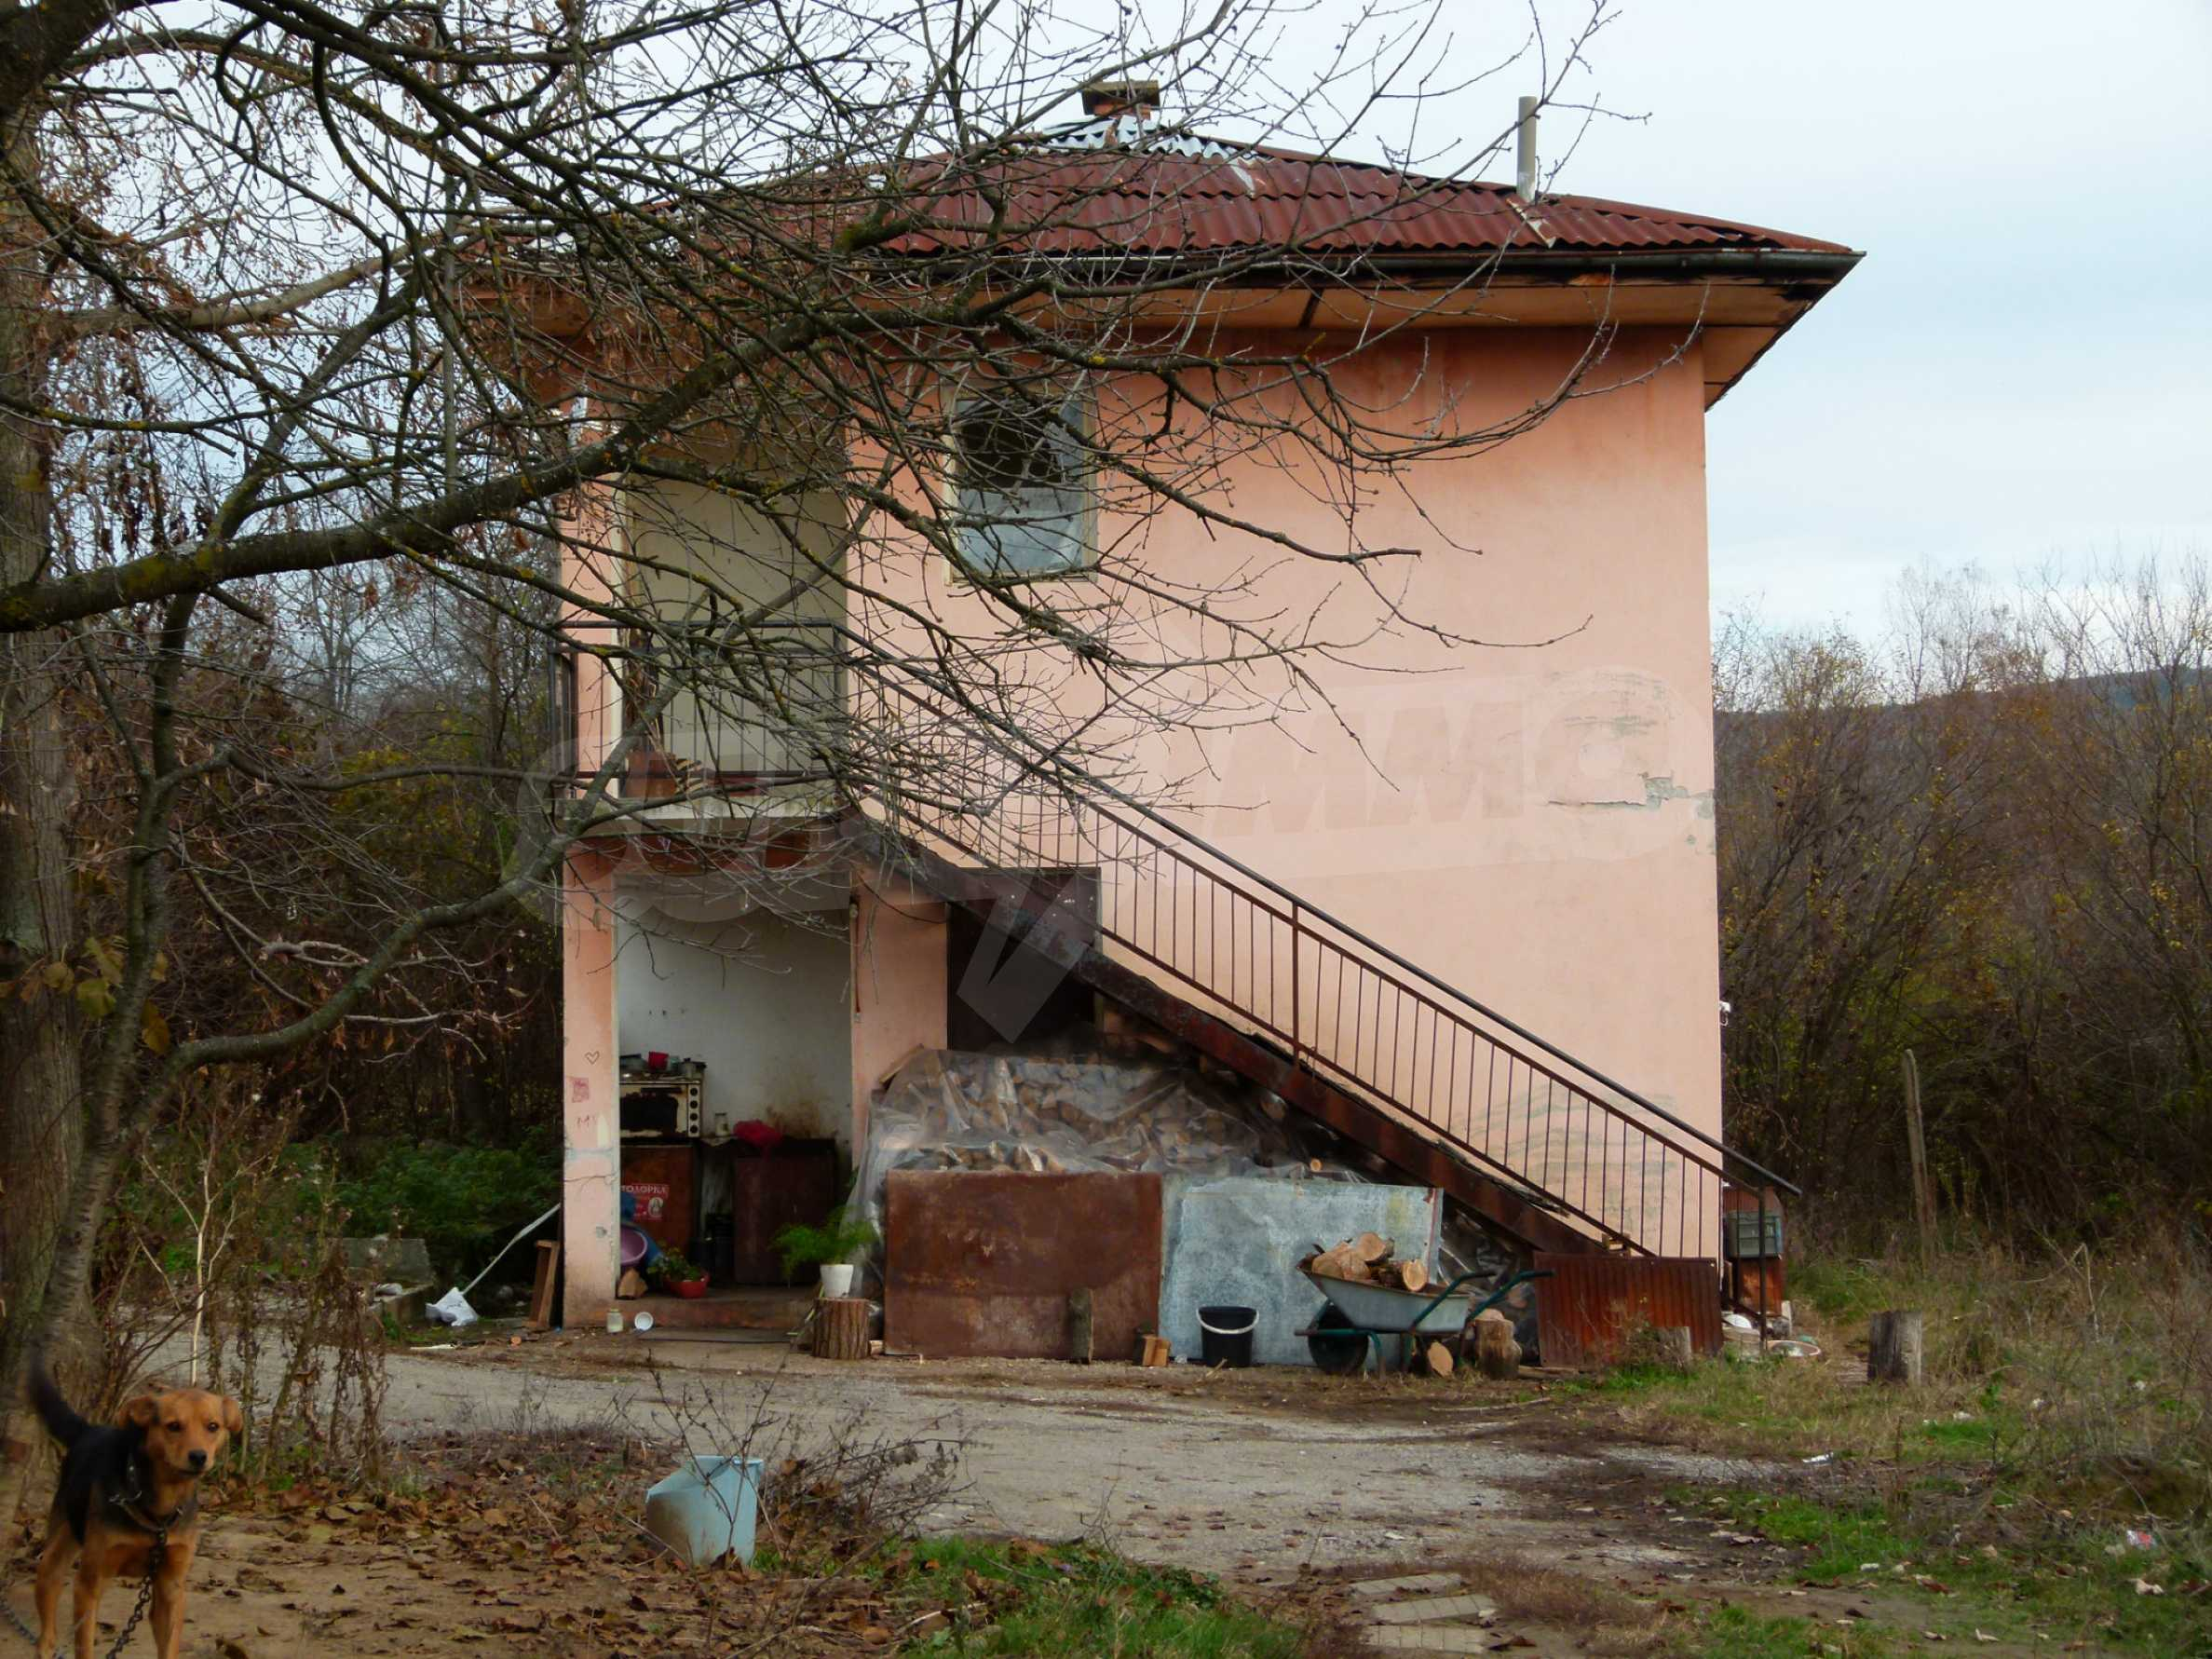 Farm in a small town 24 km from Veliko Tarnovo